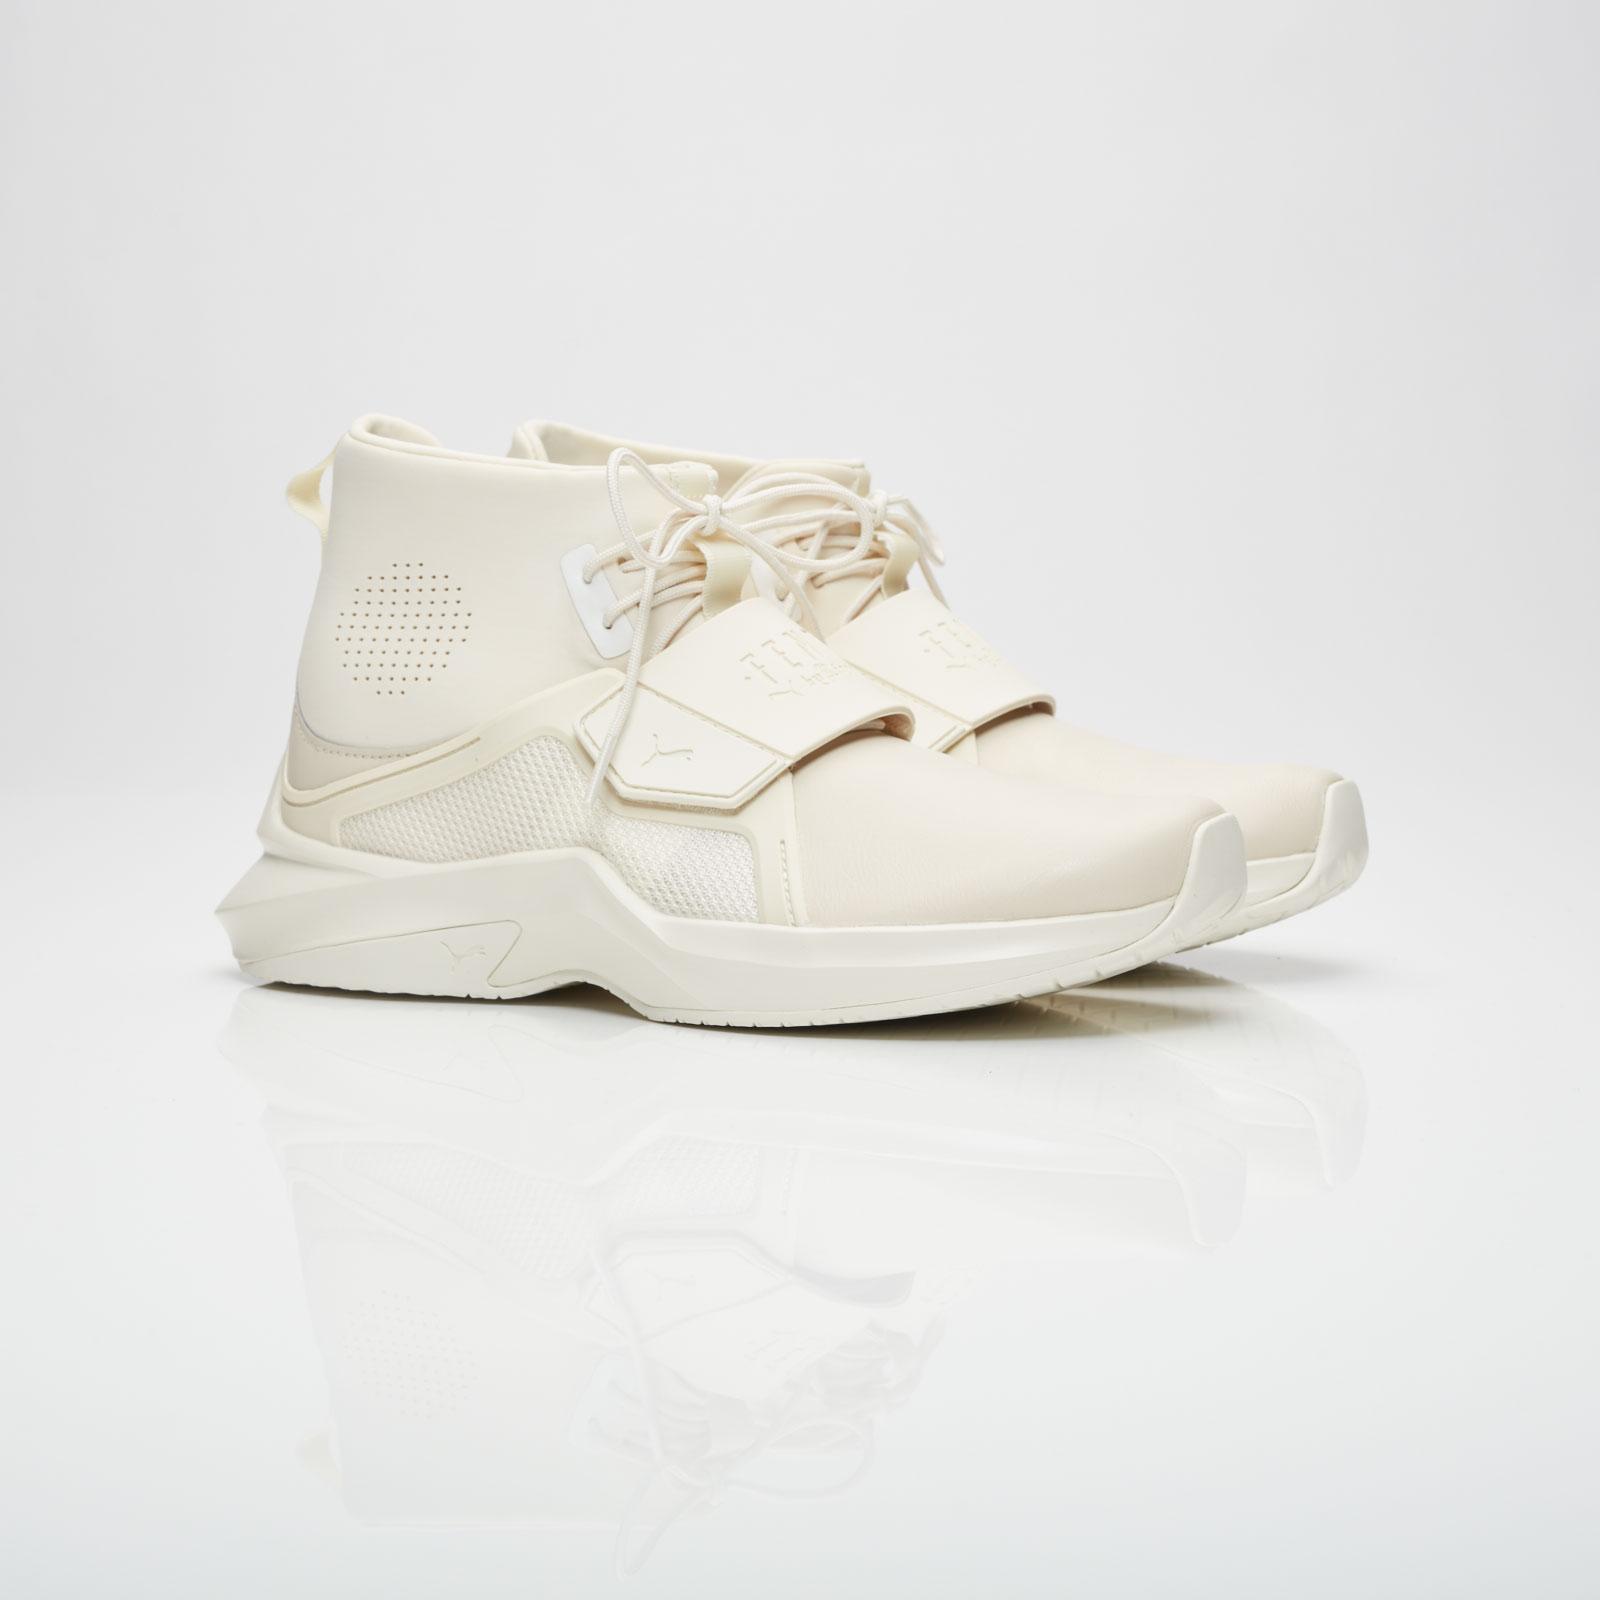 e8b86d2779b Puma Fenty Hi Leather Wns - 190398-04 - Sneakersnstuff